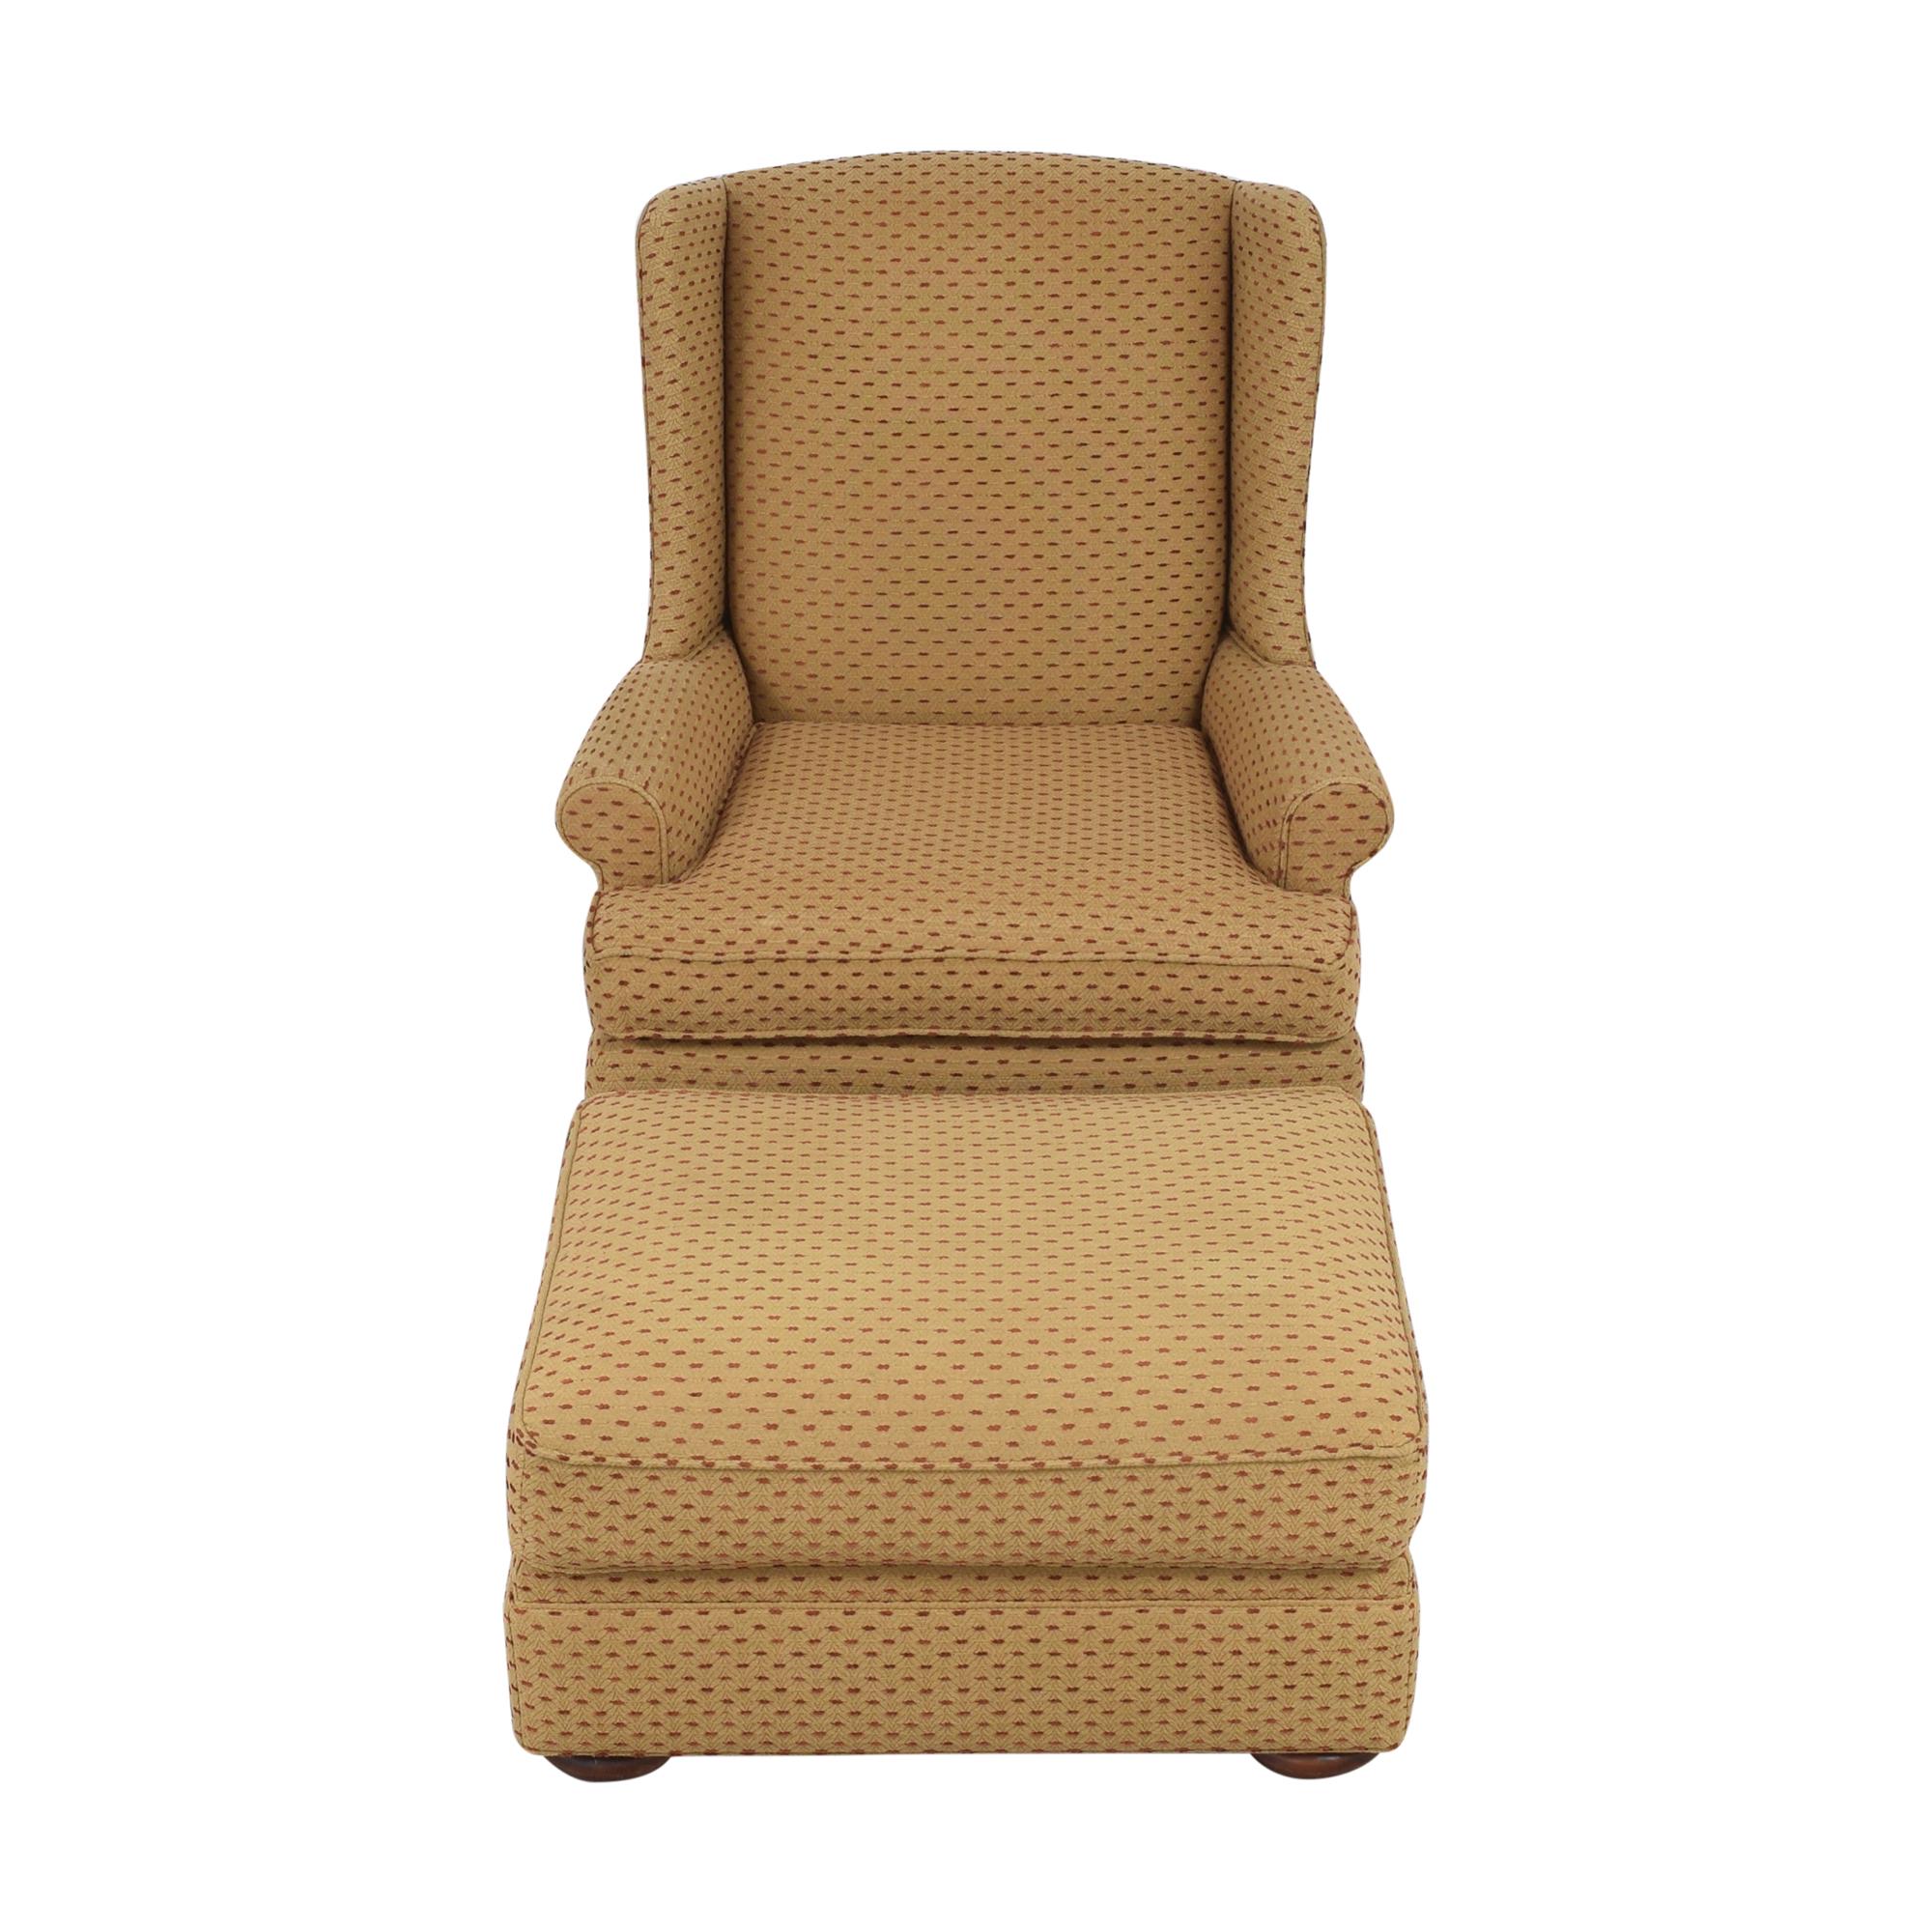 Thomasville Accent Chair with Ottoman Thomasville